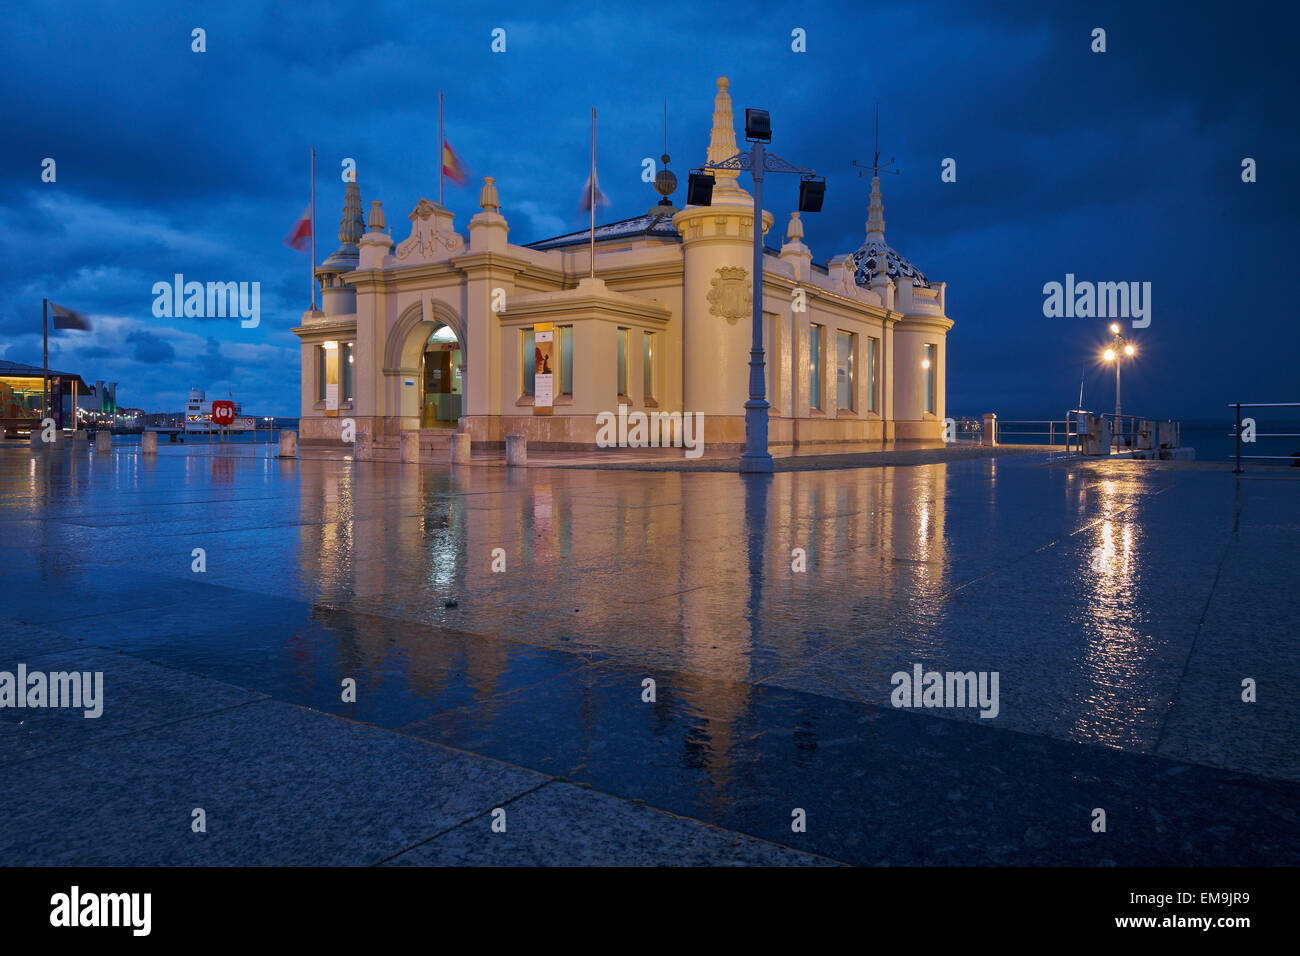 Santander: Palacete del Embarcadero at night. Spain. - Stock Image